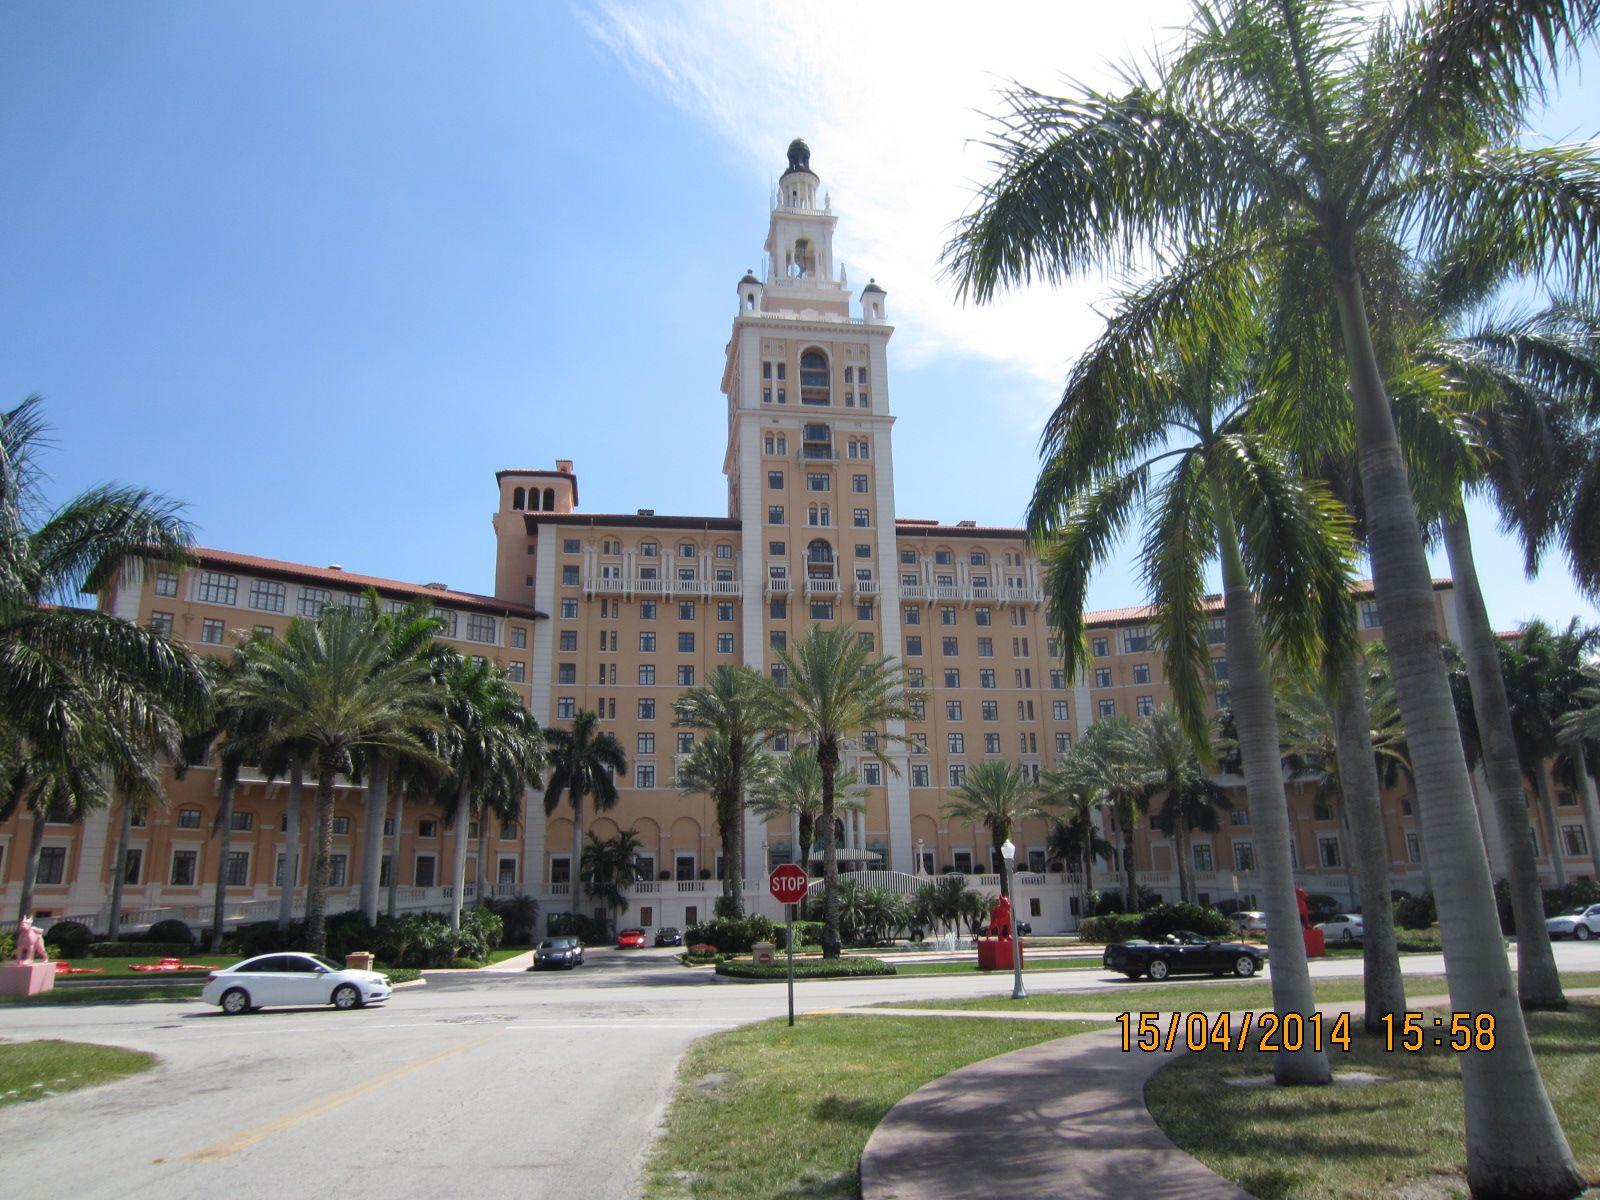 Biltmore Hotel Coral Gables Florida Viajes